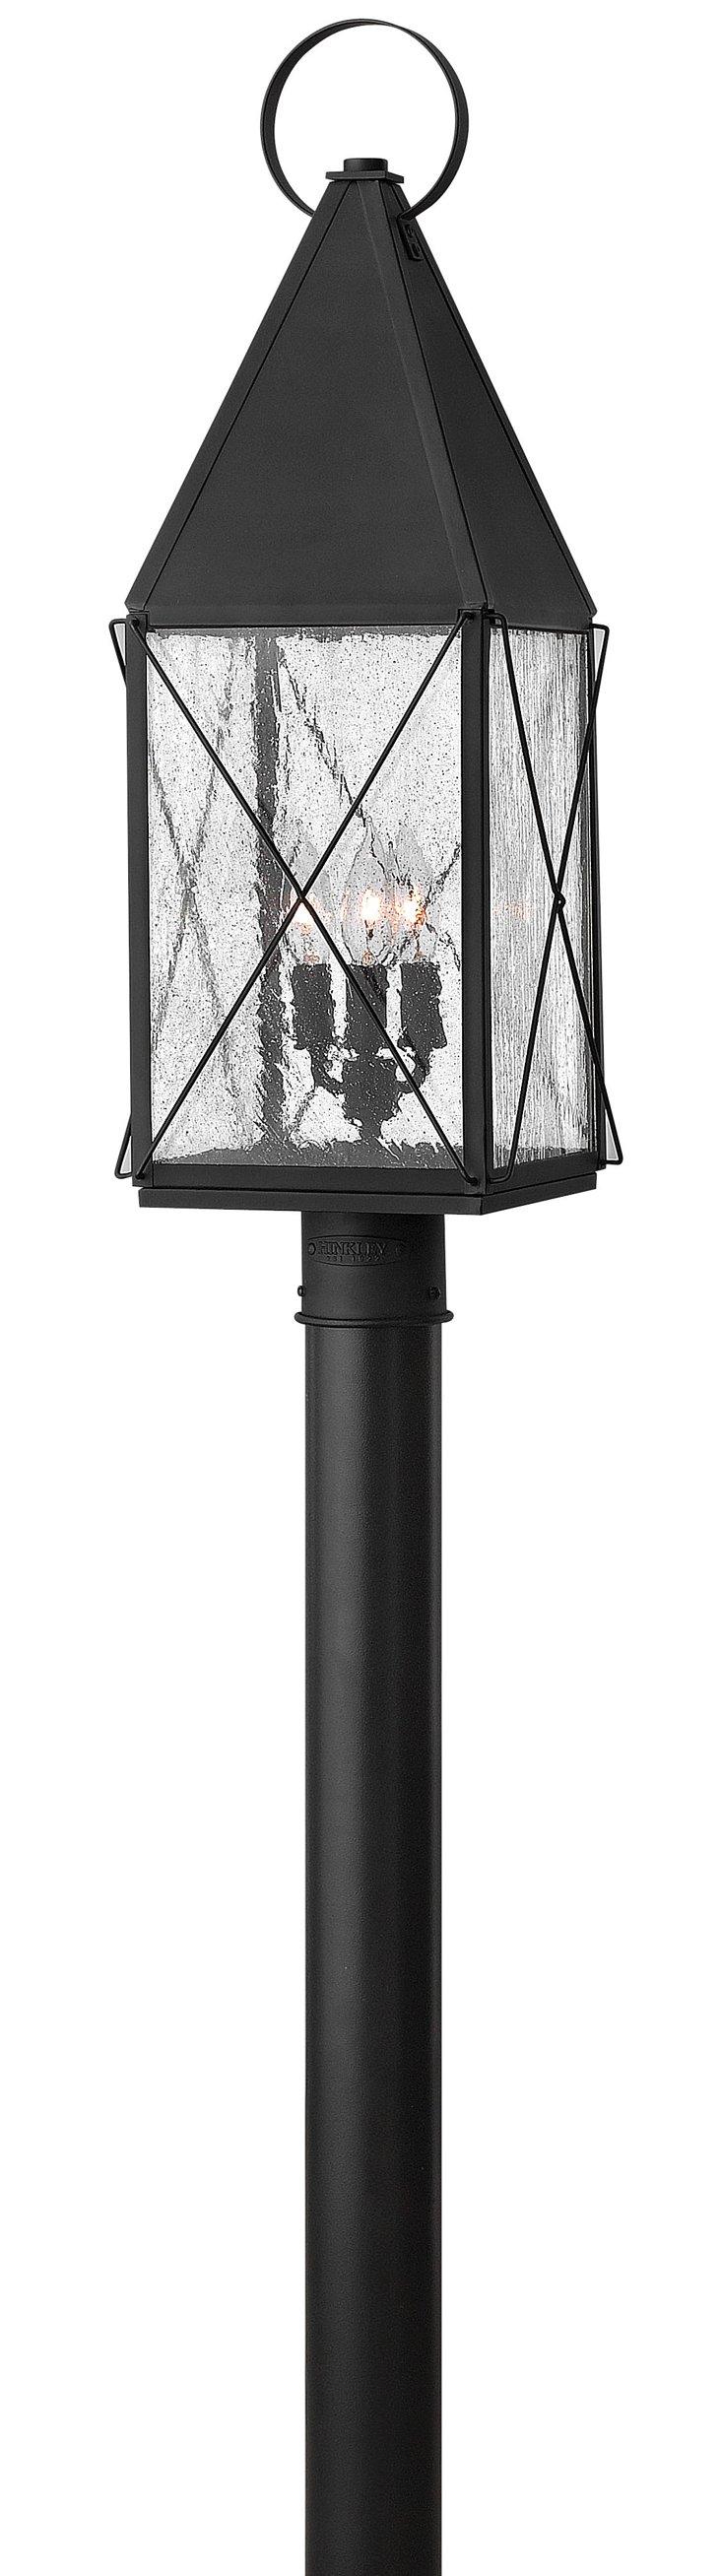 York Post Lantern, Black